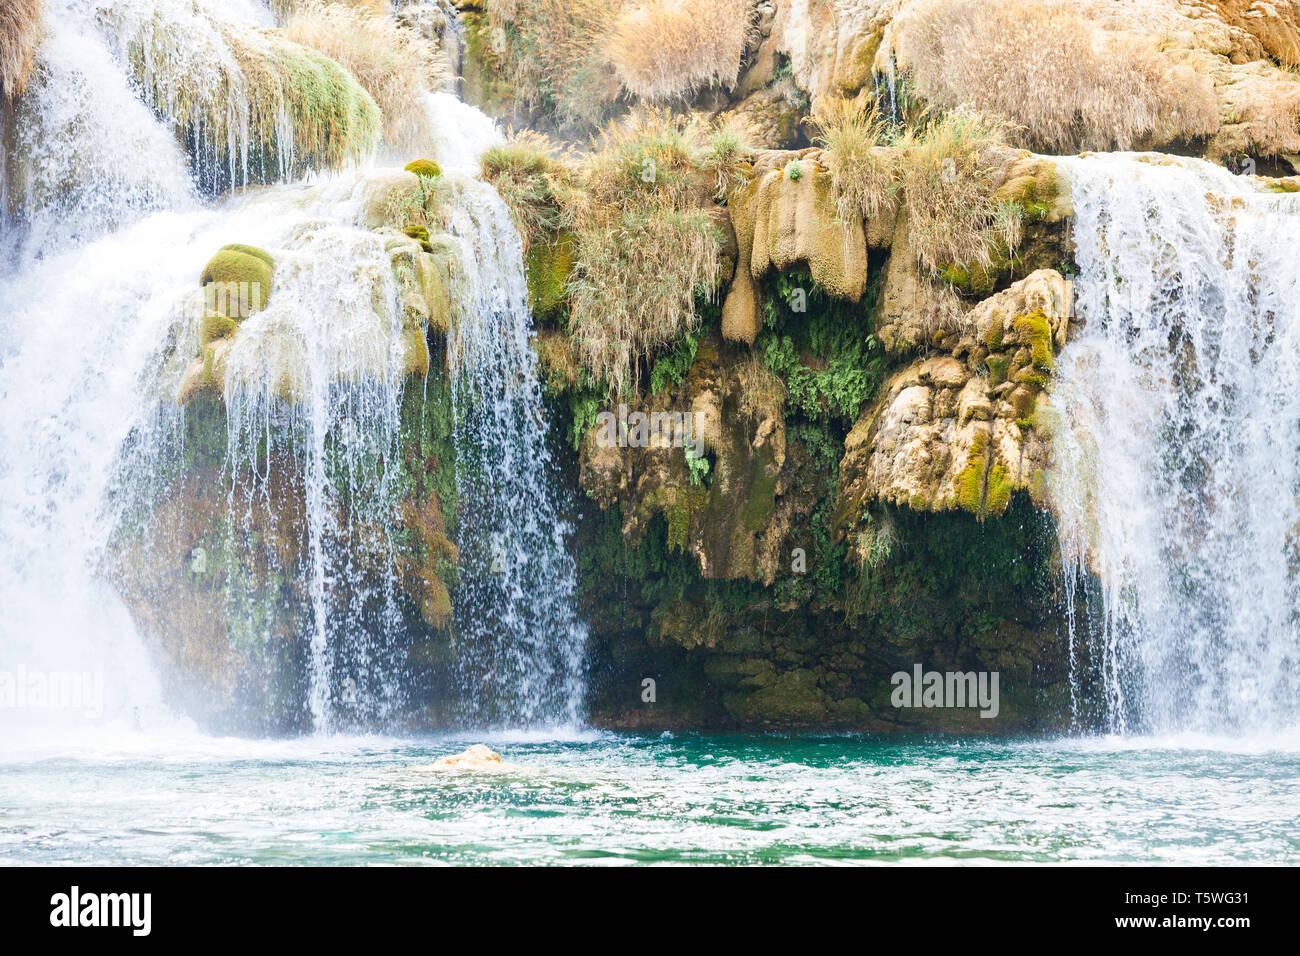 Krka, Sibenik, Kroatien, Europa - Überhang unter einem Wasserfall im Nationalpark Krka Stockfoto